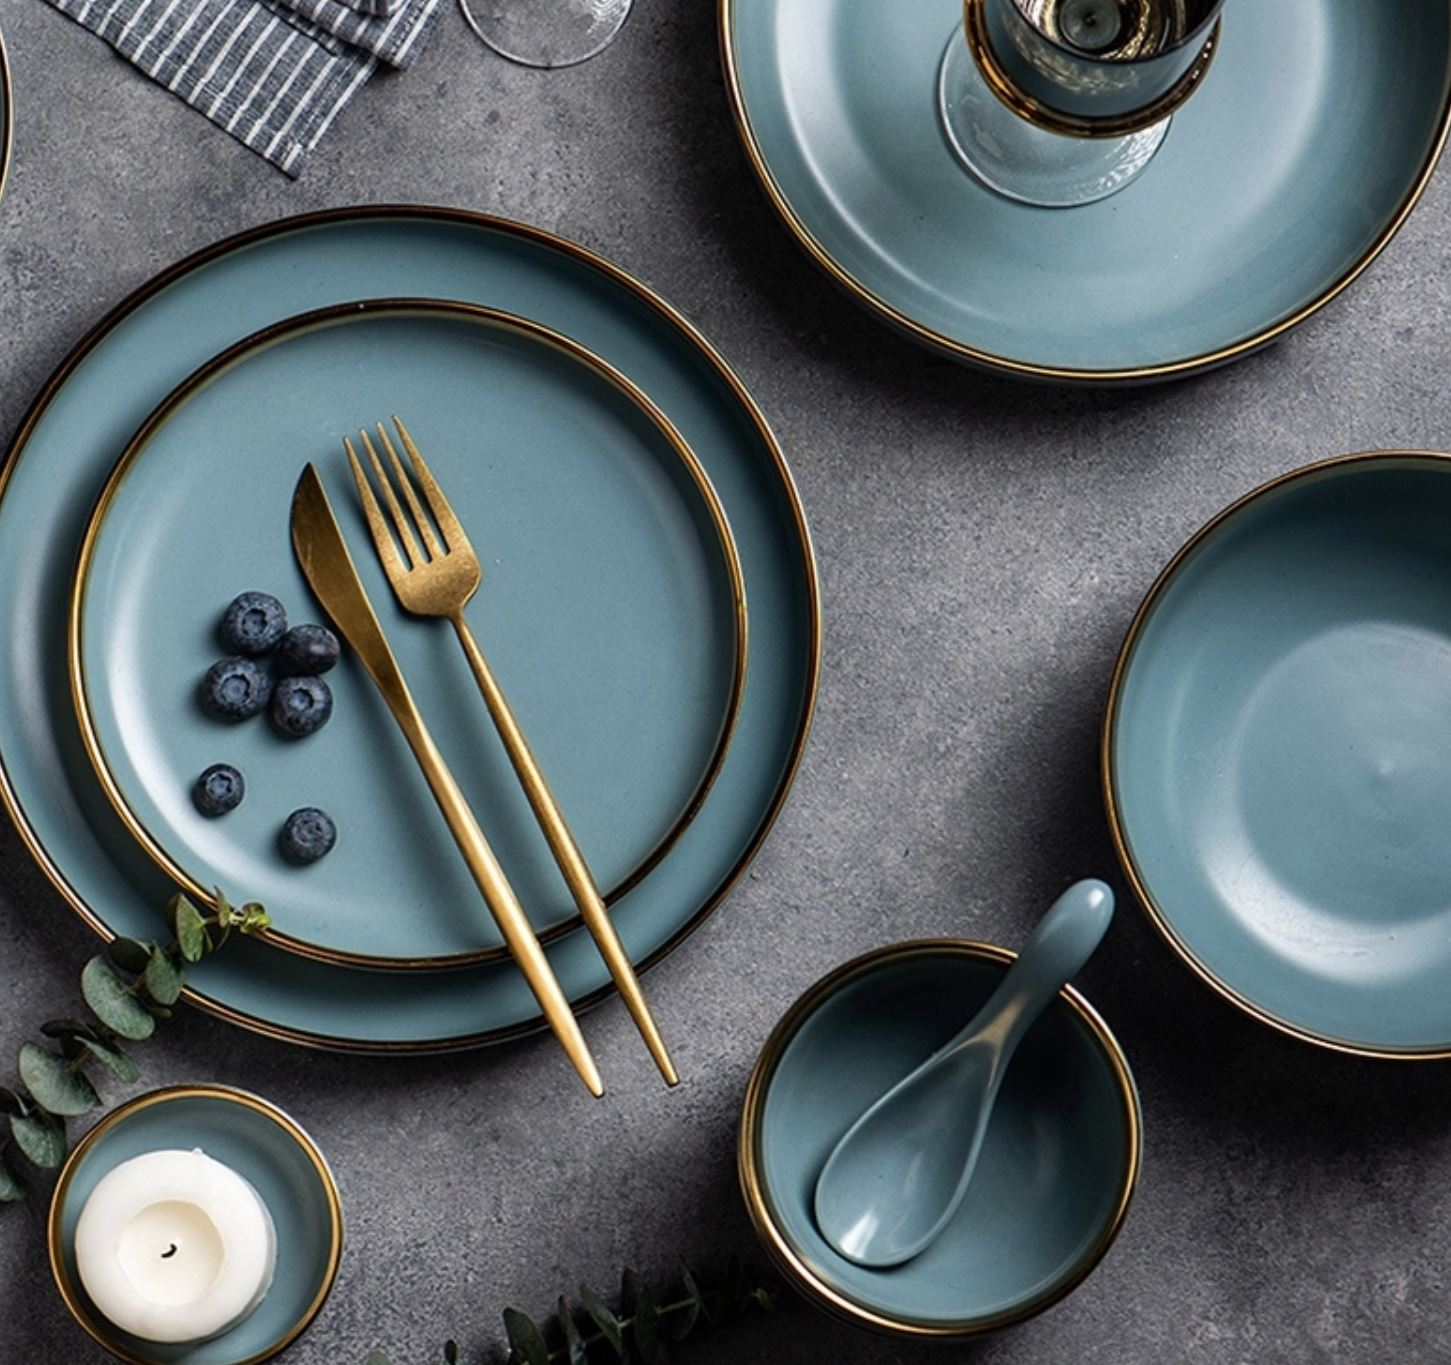 Set Blue Gold Modern Minimalist Trendy Ceramic Plate Porcelain 1 8 Inch 1 10 Inch Platter Total Of 2 Pcs Lazada Ph